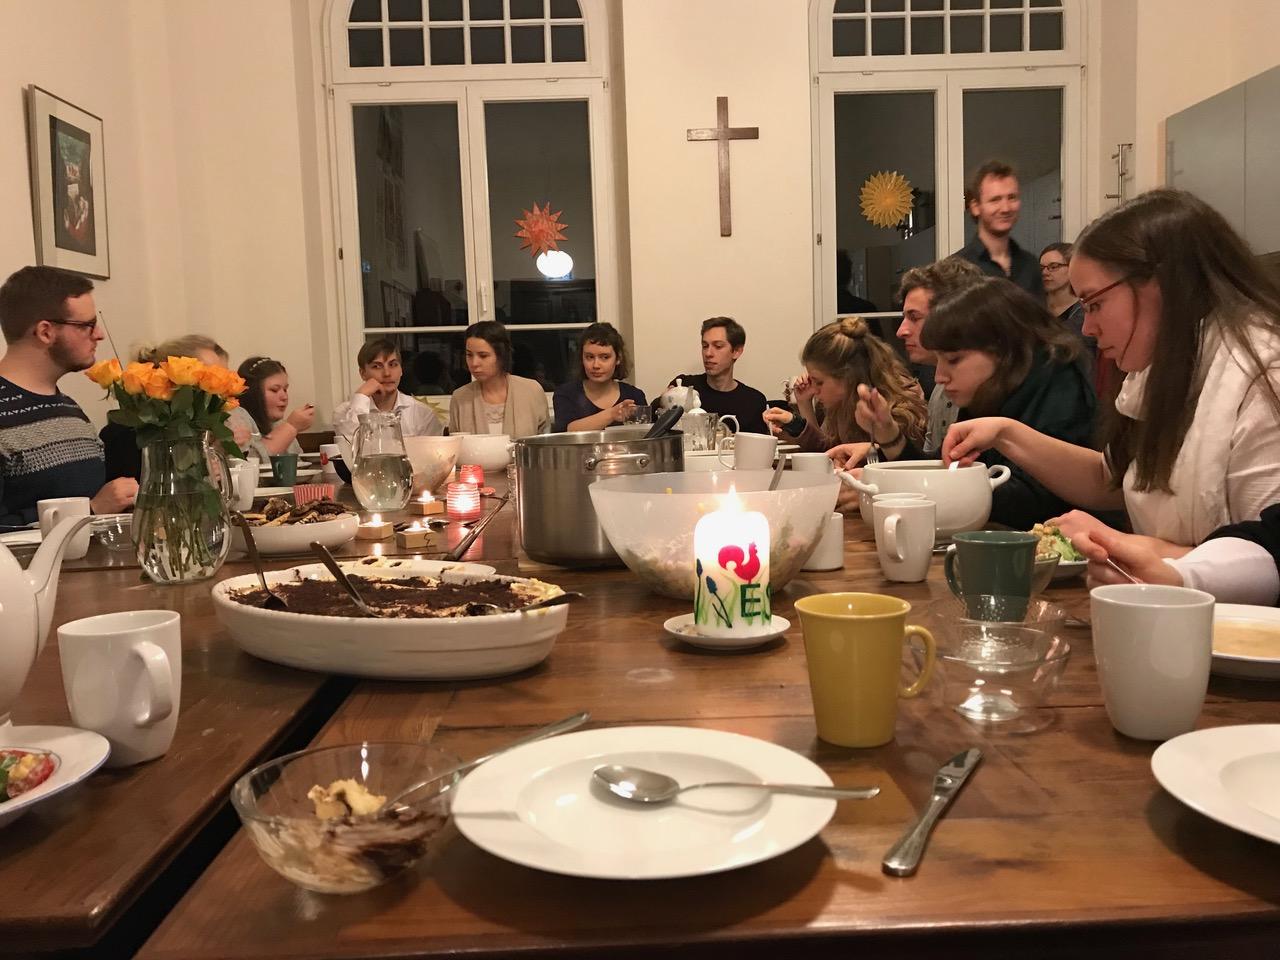 Weihnachten hinter Gittern / Adventfeier